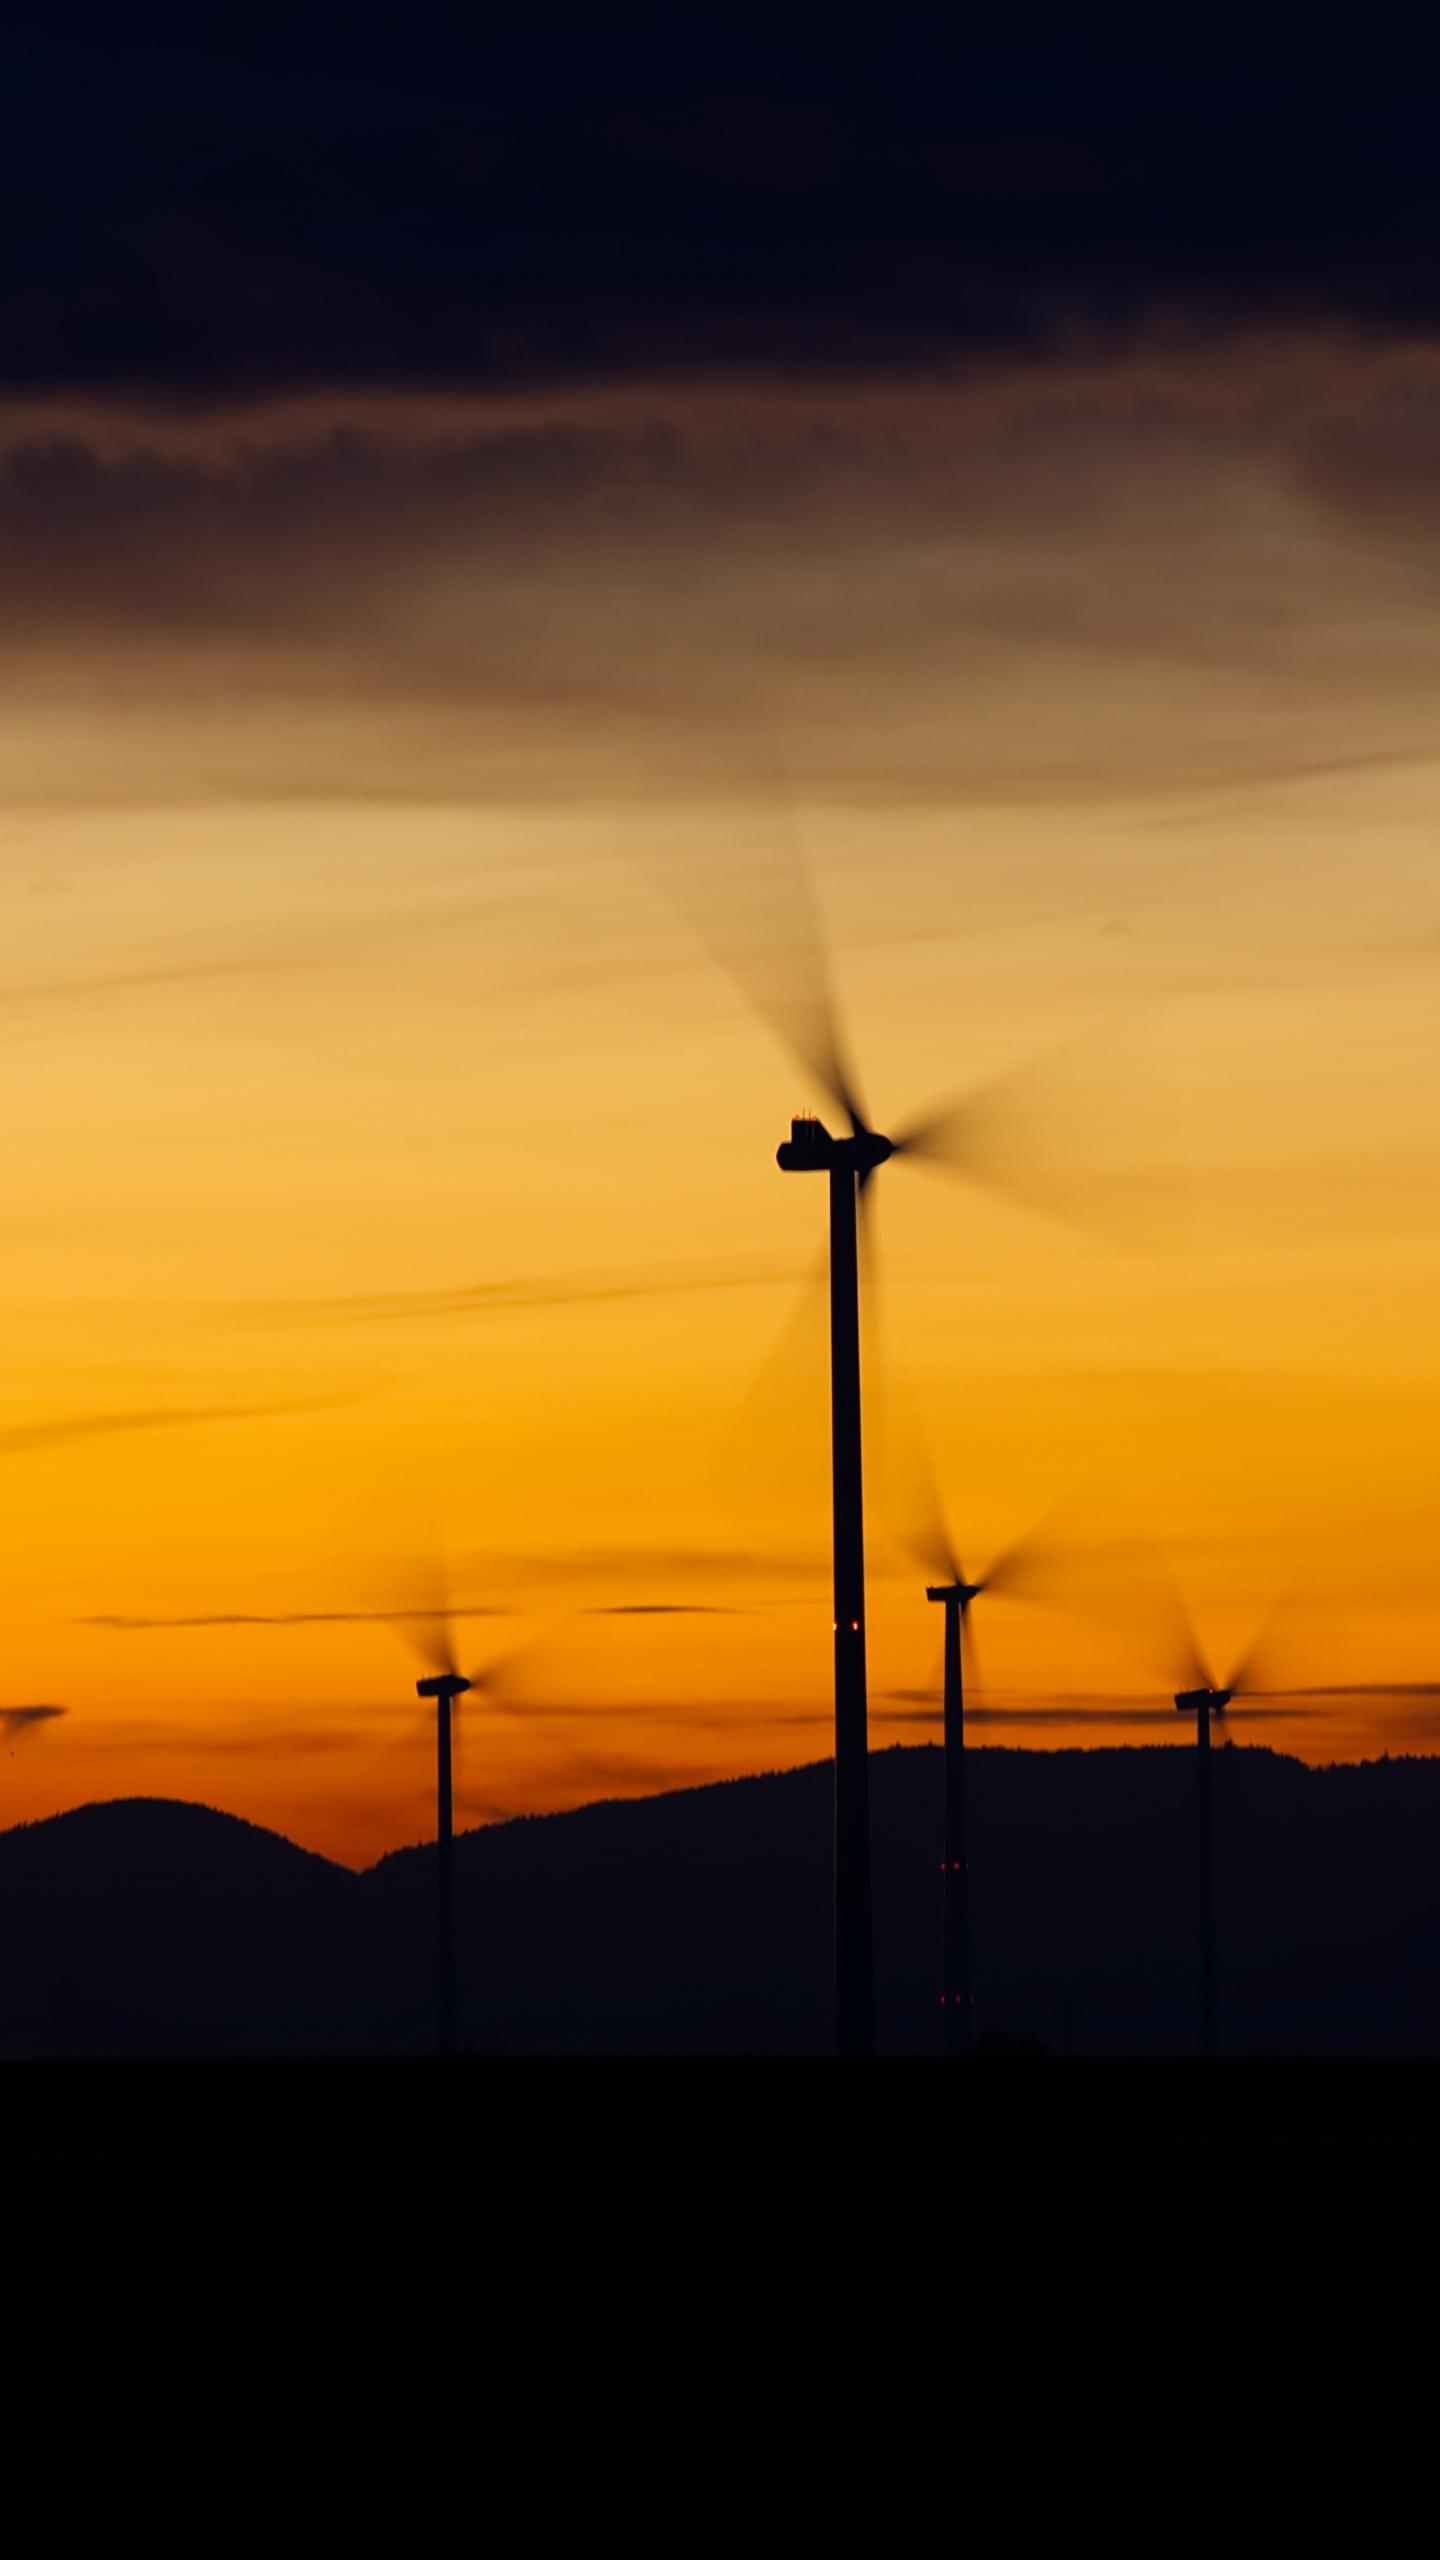 Windrader, windmill, sunset, 1440x2560 wallpaper